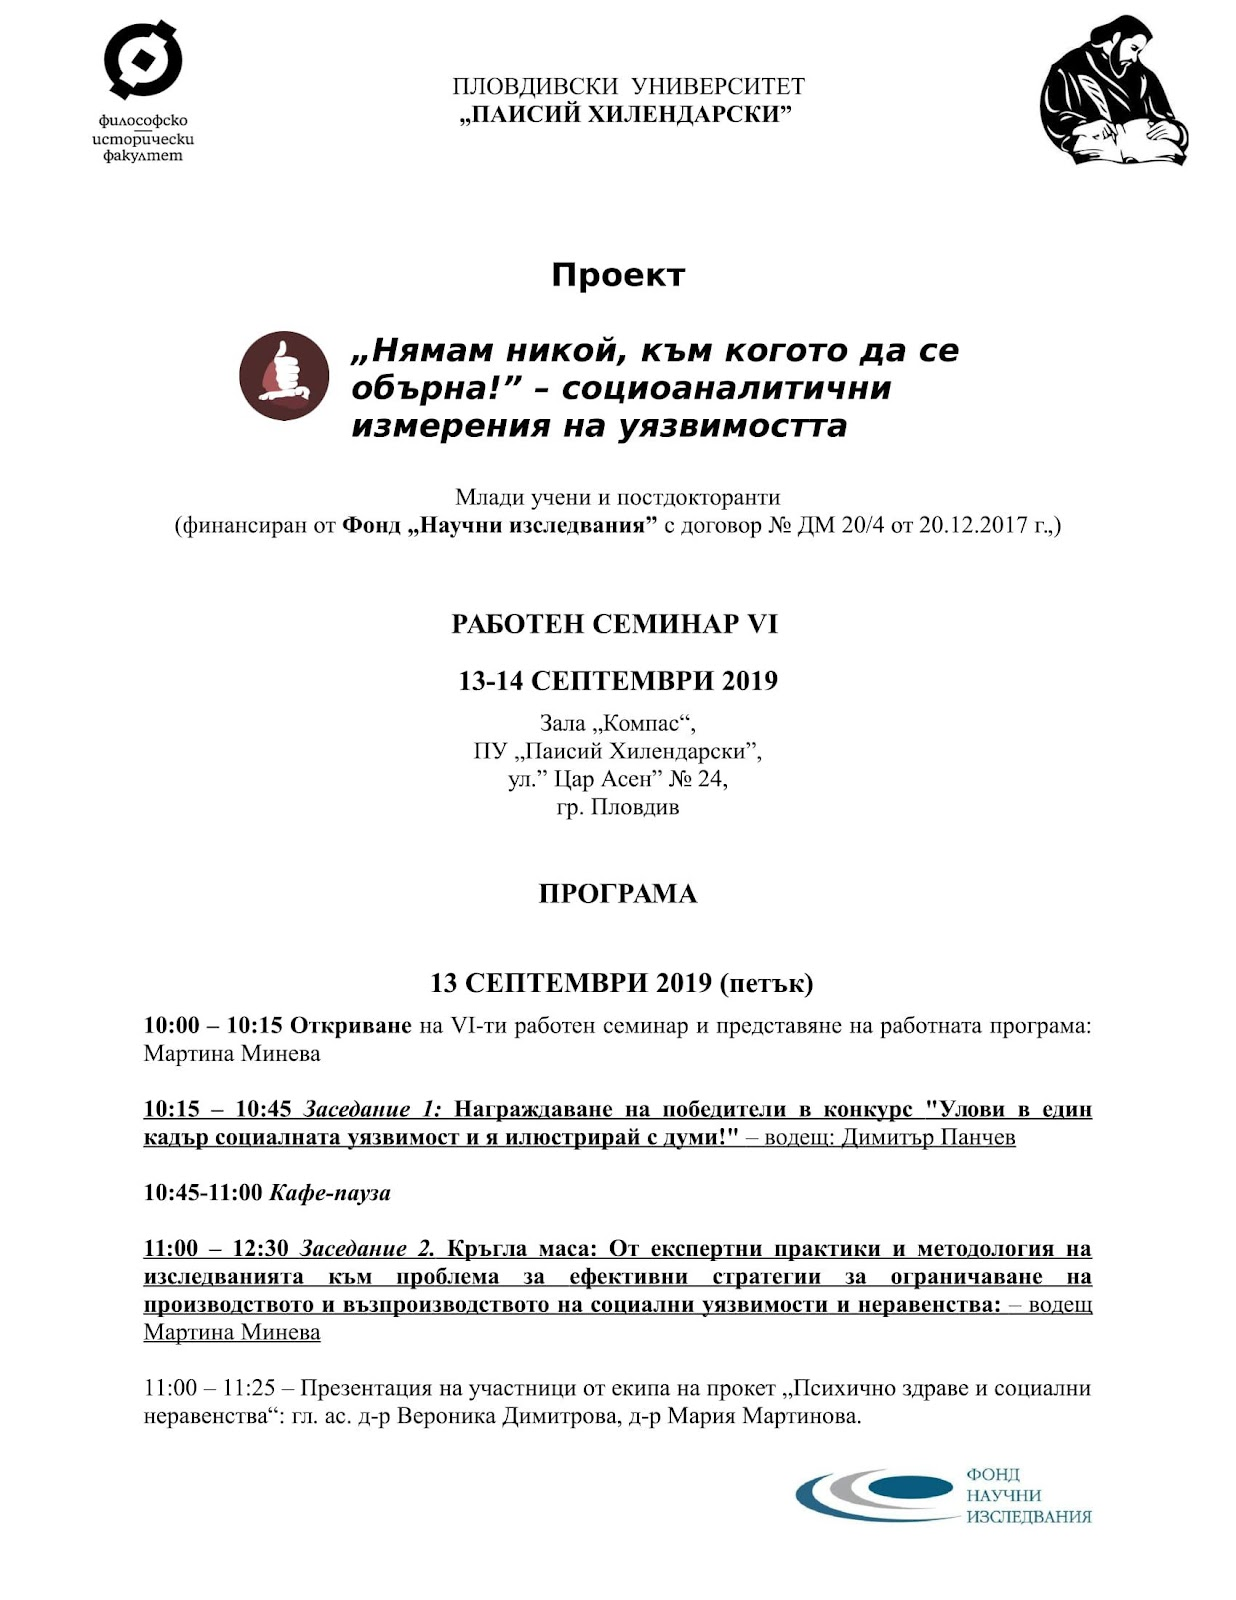 C:\Users\SclgLab\Dropbox\Rony\фундаментални-псих\Доклад\приложения\Programa-13-14.09.2019-Seminar-6-proekt-1.jpg